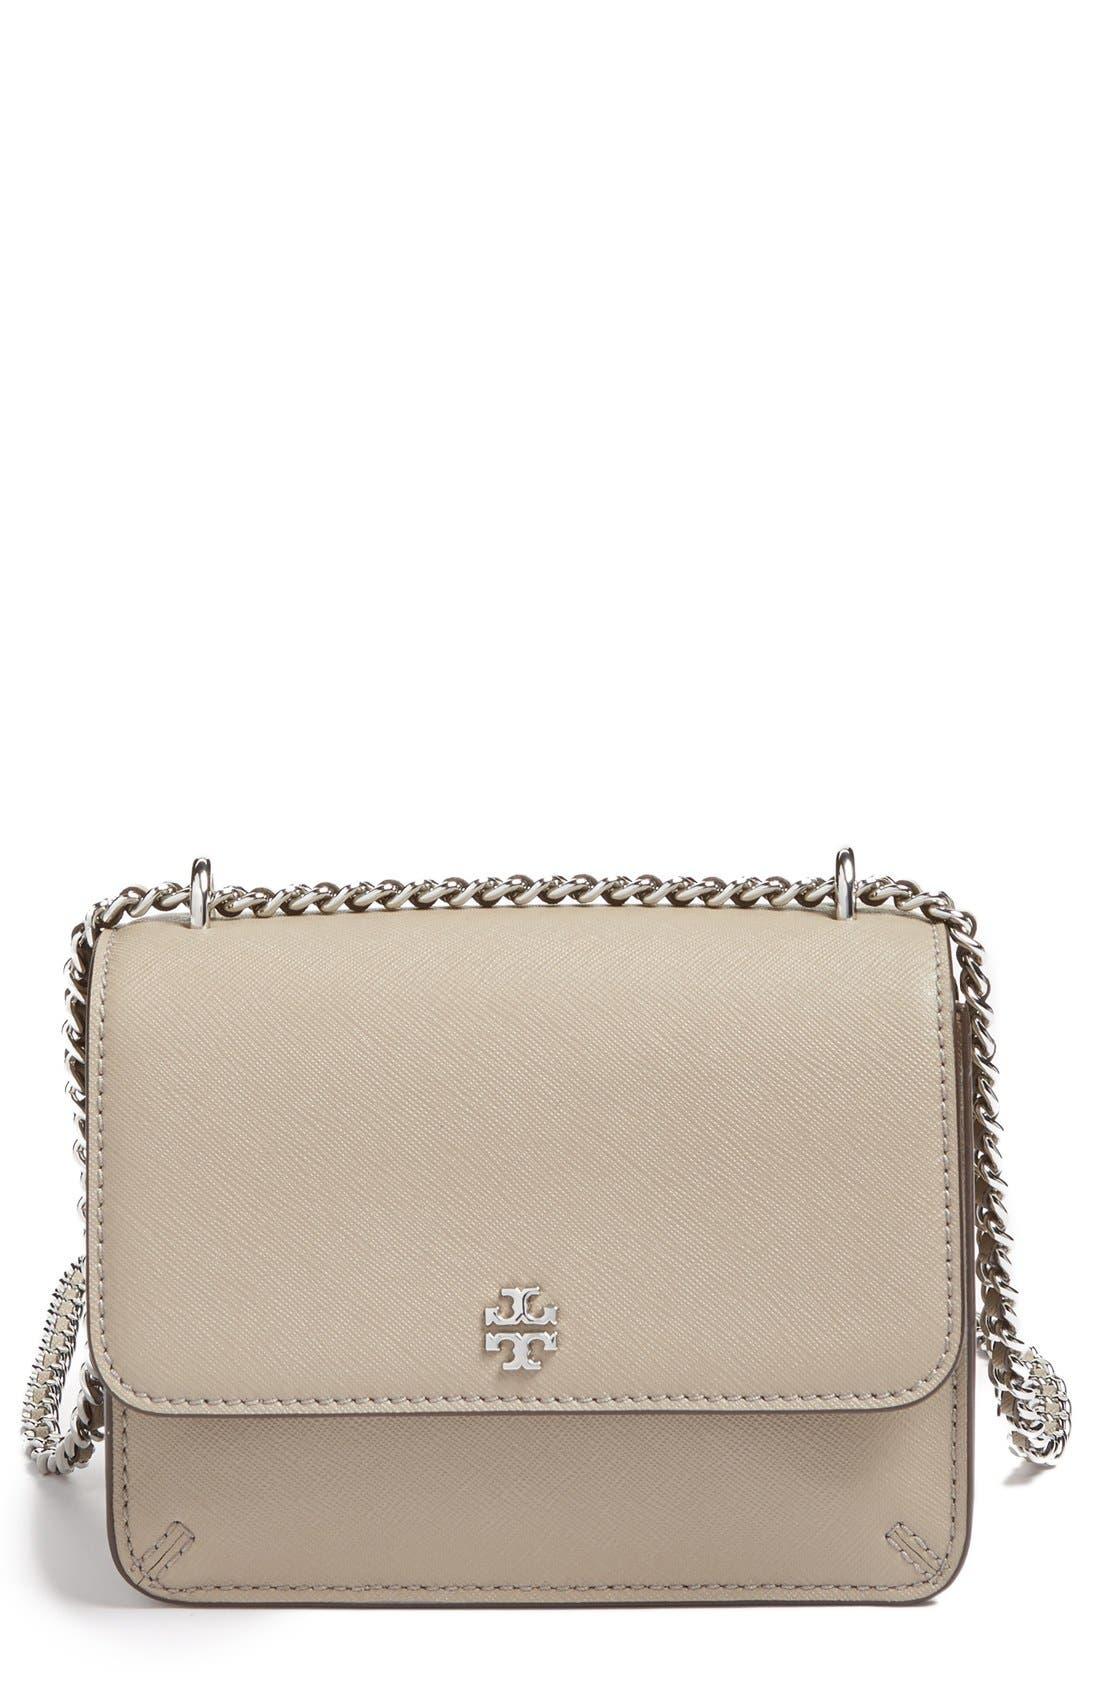 Mini Robinson Convertible Leather Shoulder Bag,                             Main thumbnail 1, color,                             036